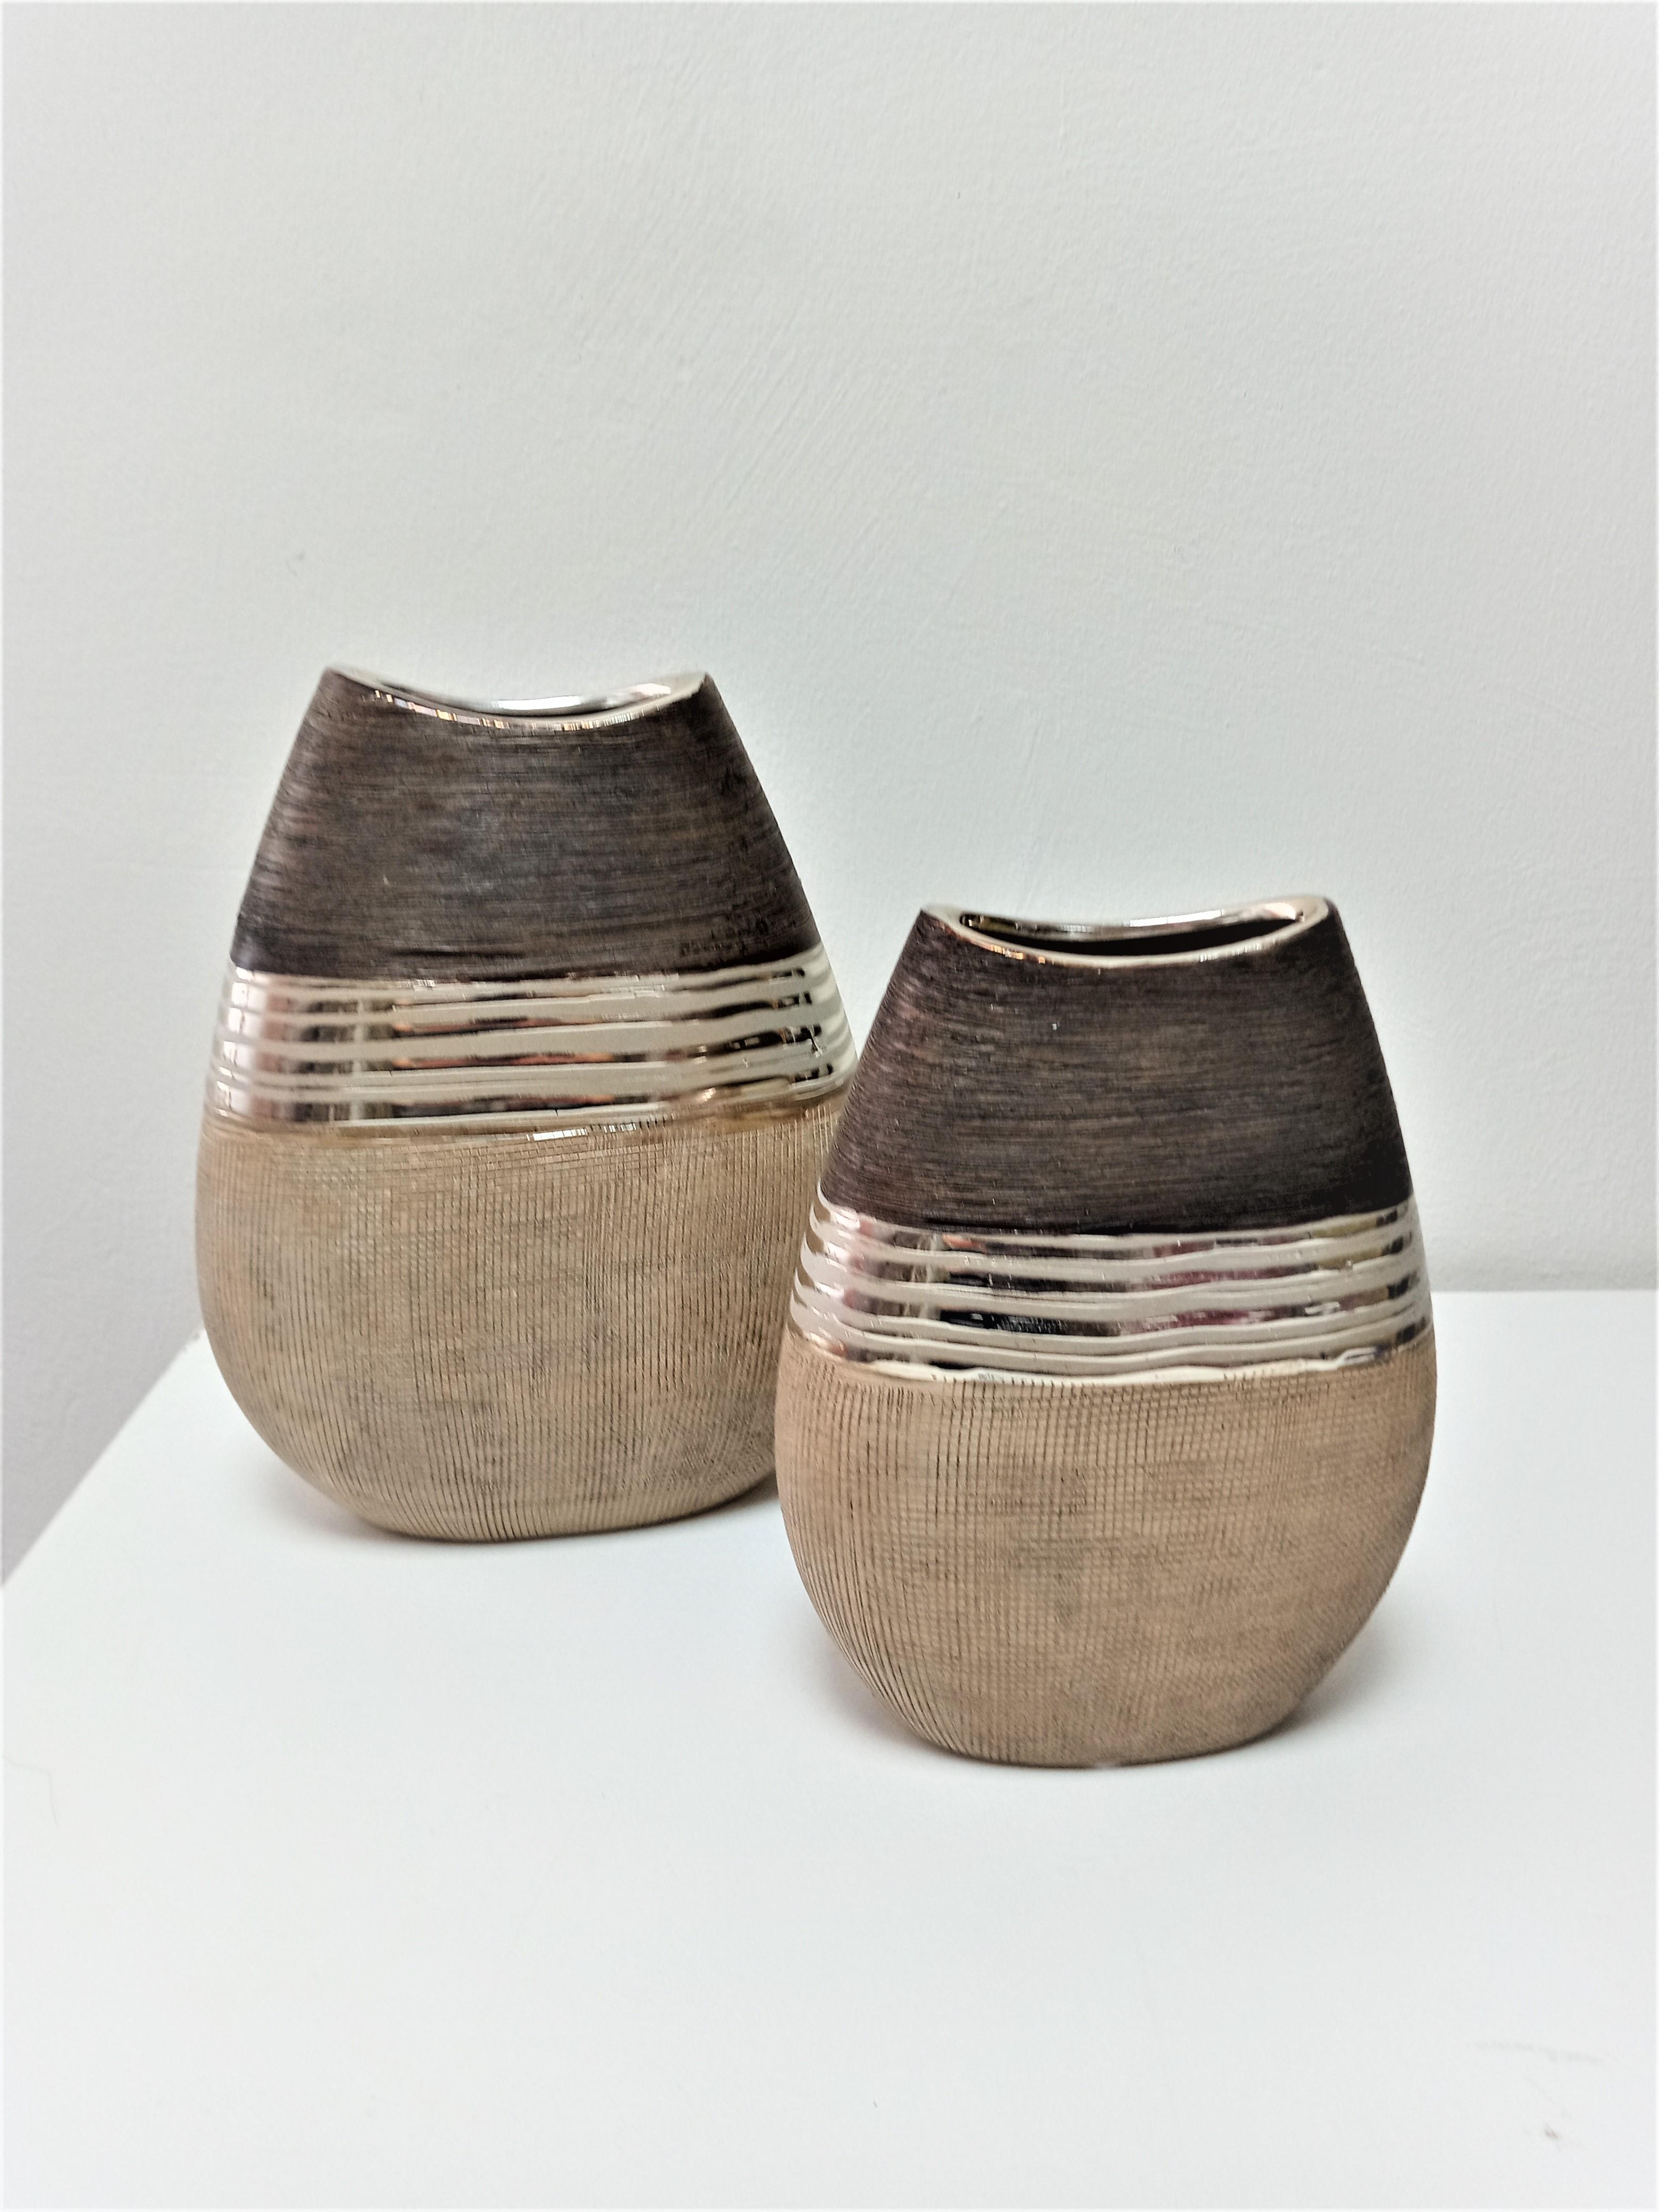 Gilde Keramik  flache Vase Bradora braun/gold